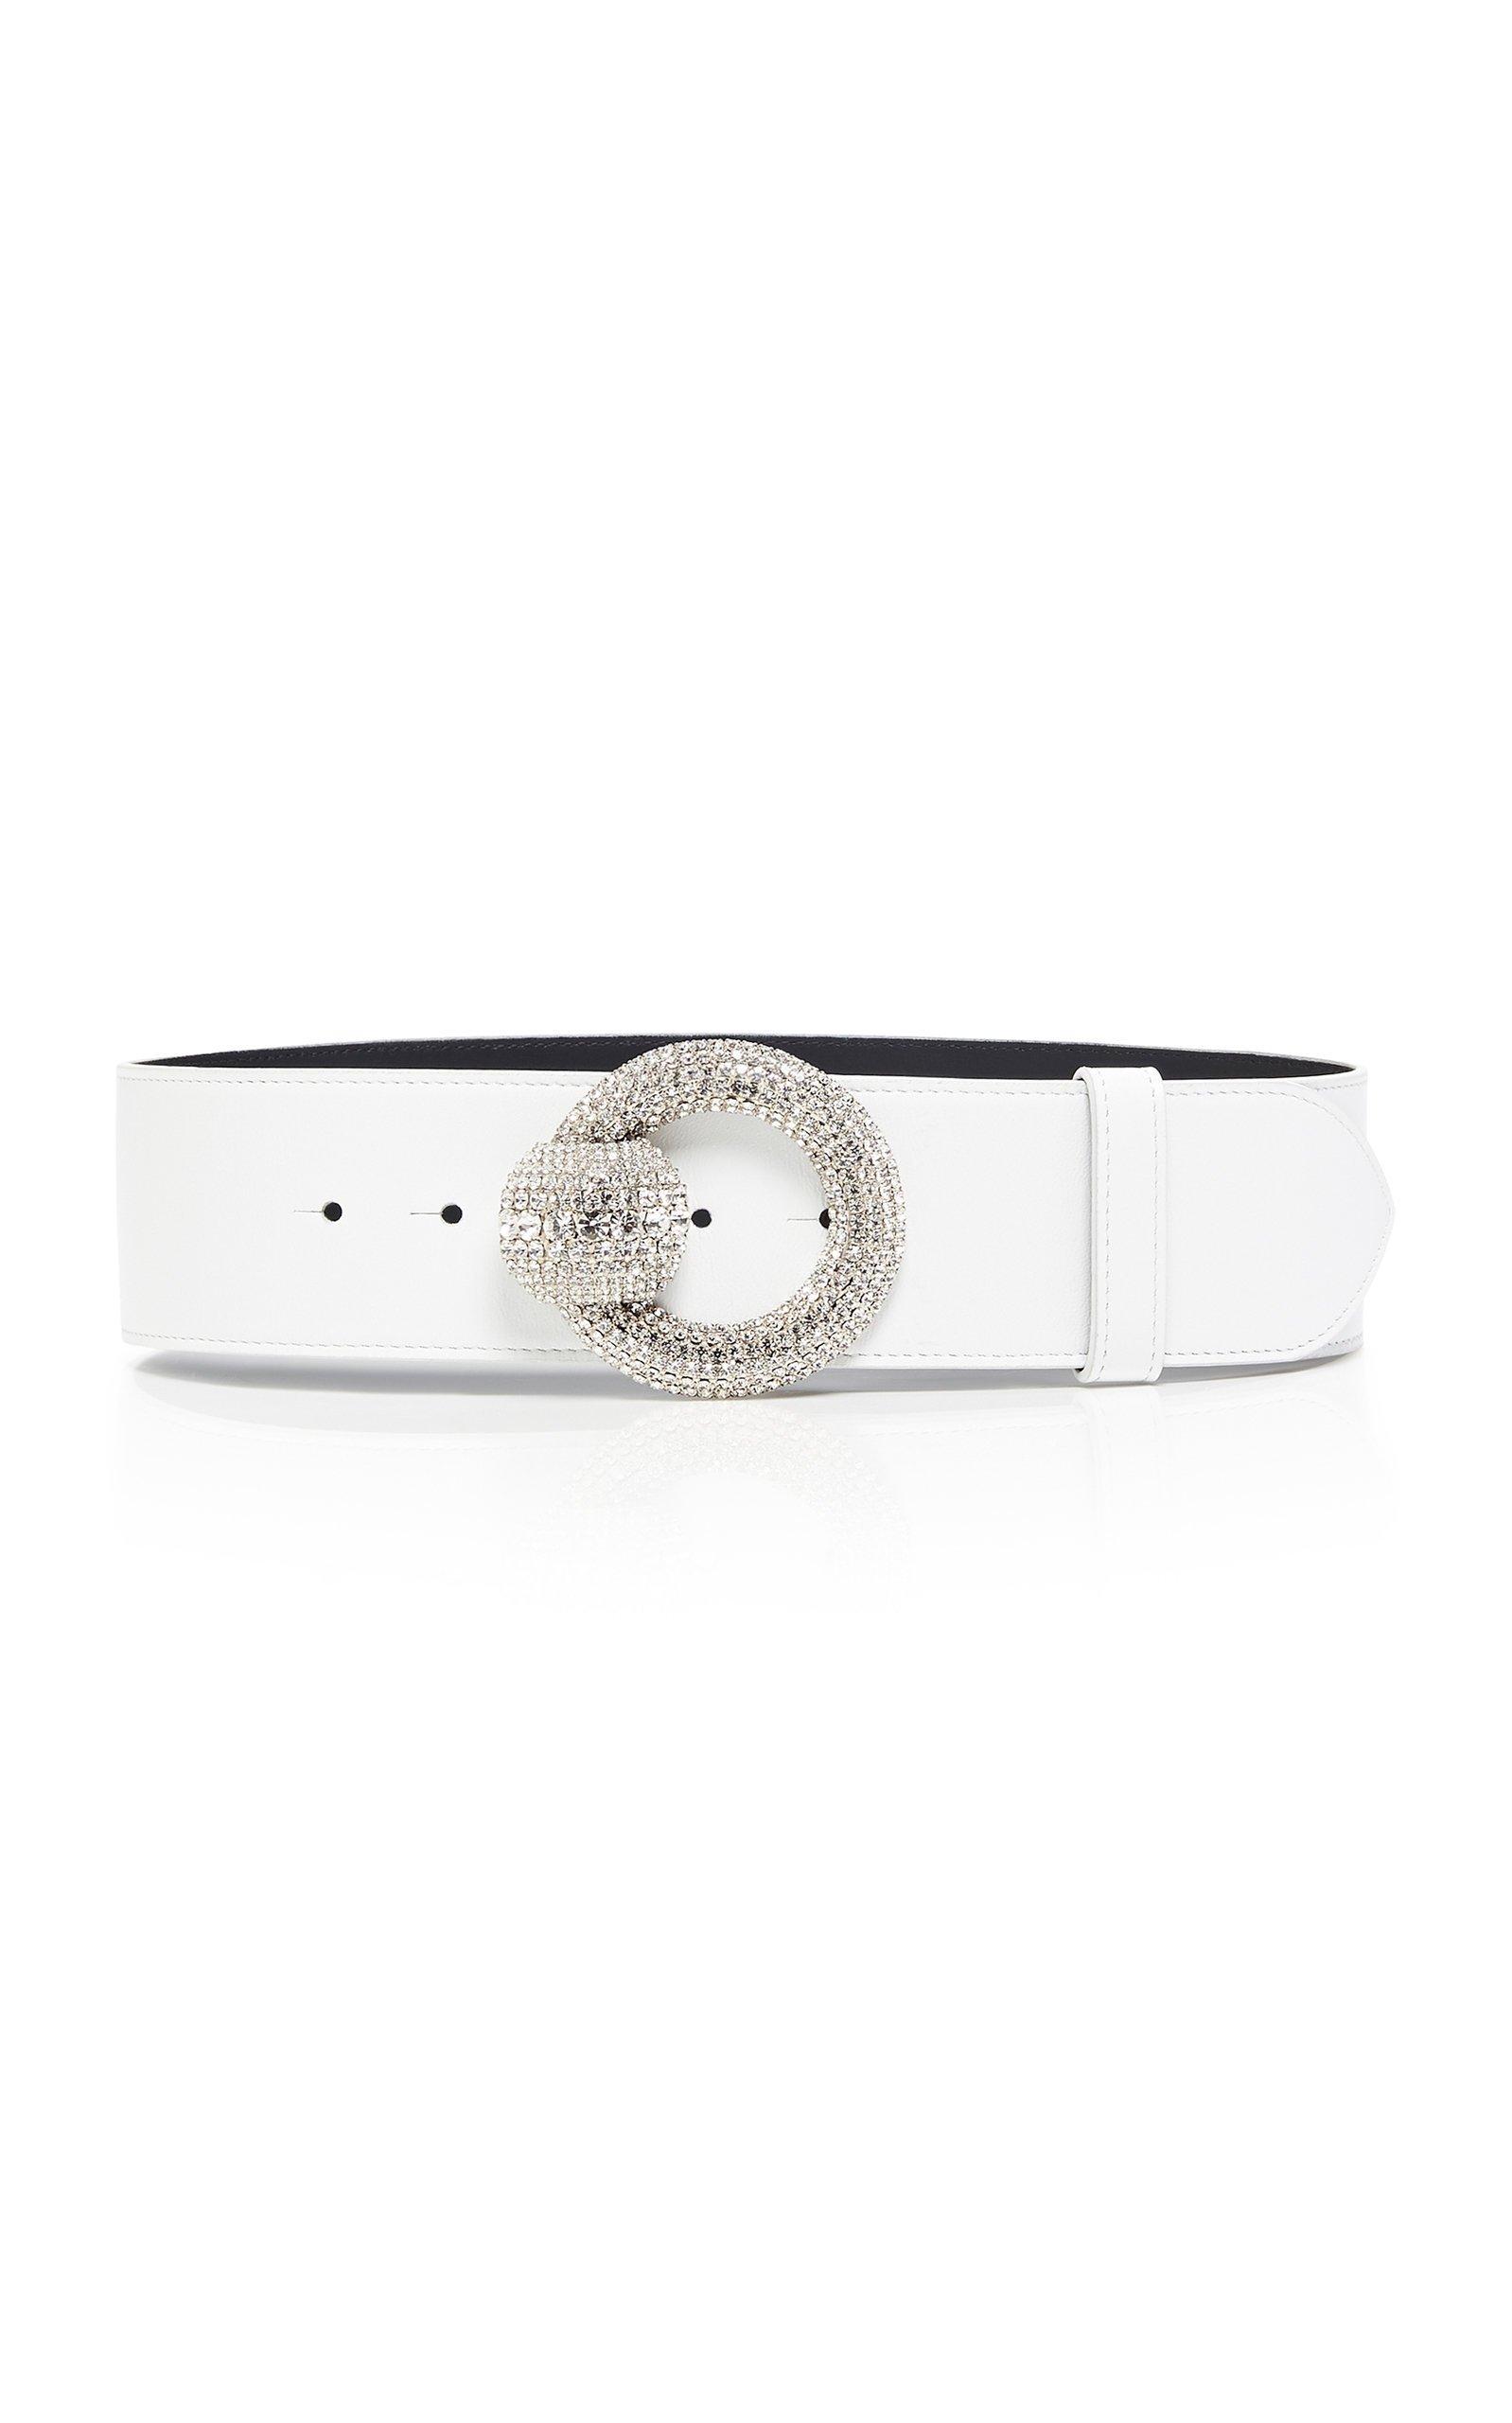 Alessandra Rich Glass Crystal-Embellished Buckle Leather Belt Size: L